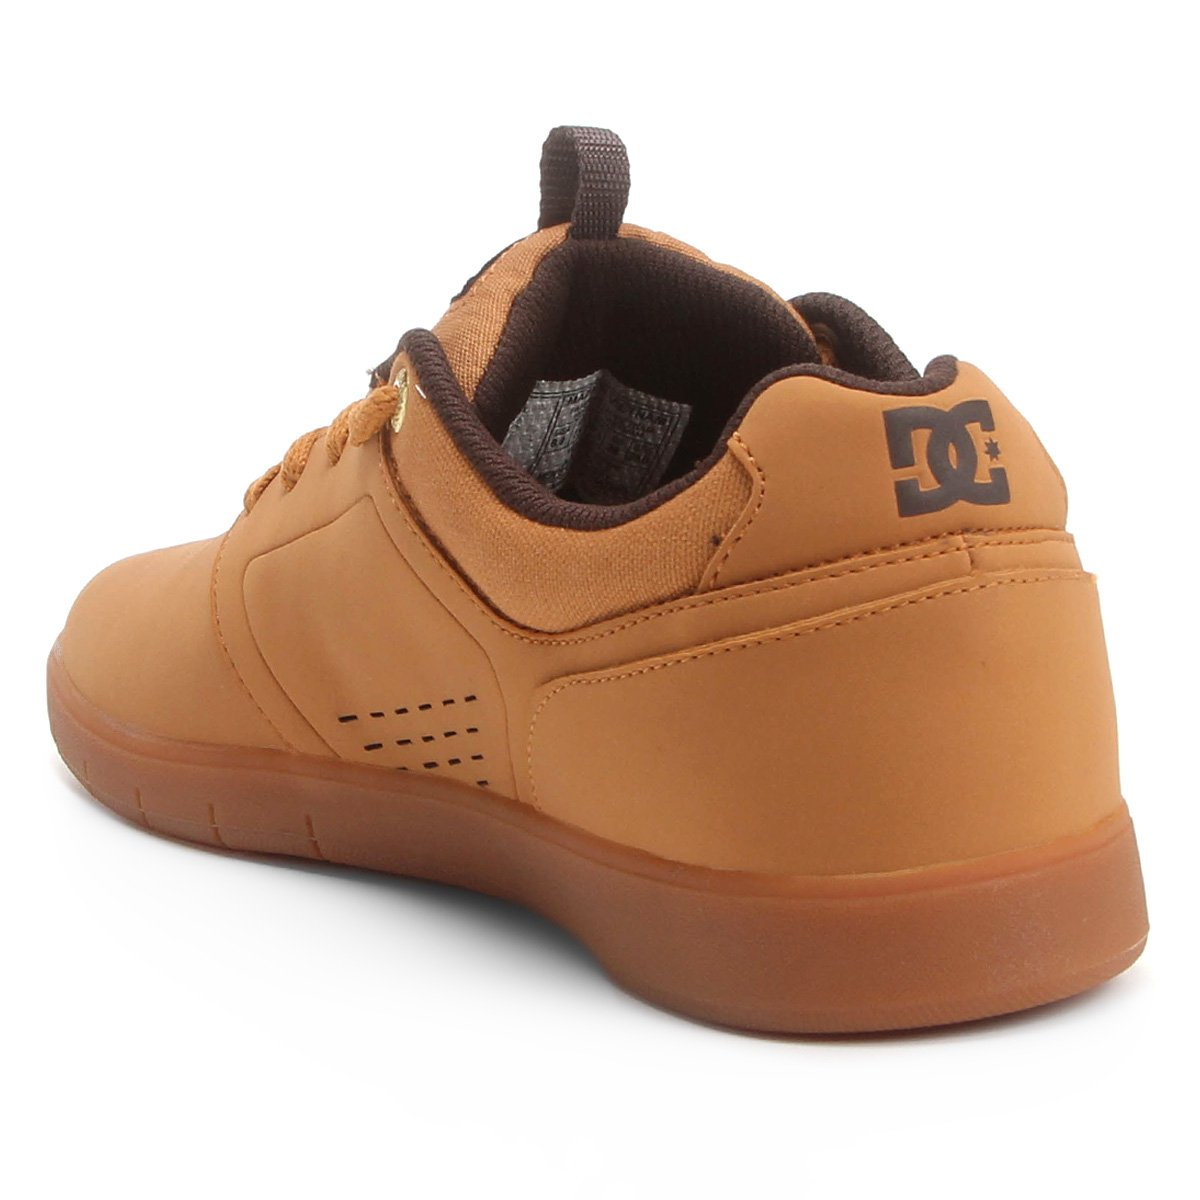 1c8a2bb8ed ... Tênis Caramelo Shoes Tênis DC DC Masculino Cole Signature 5WqFHH0nwR ...